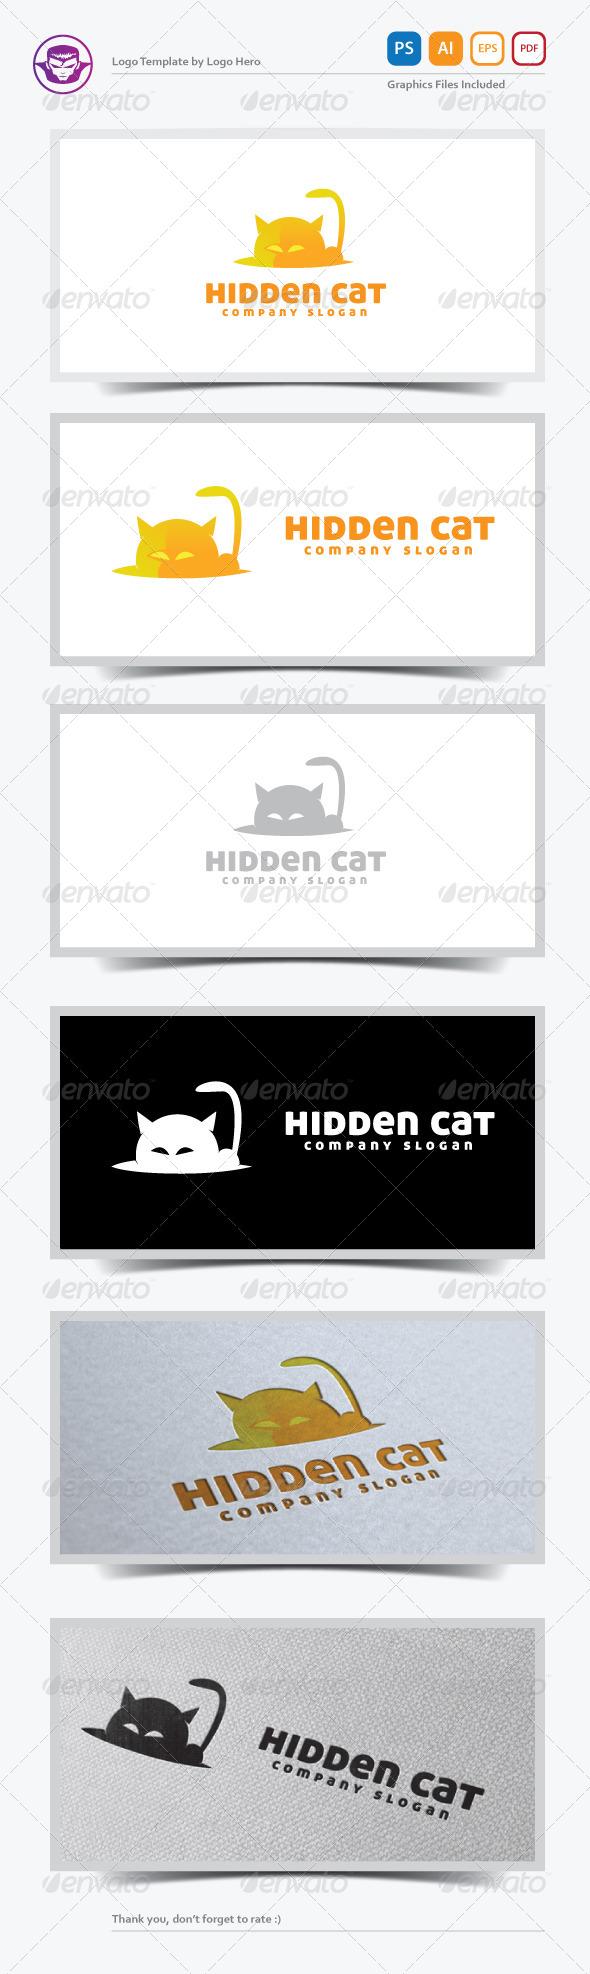 GraphicRiver Hidden Cat Logo Template 5471127